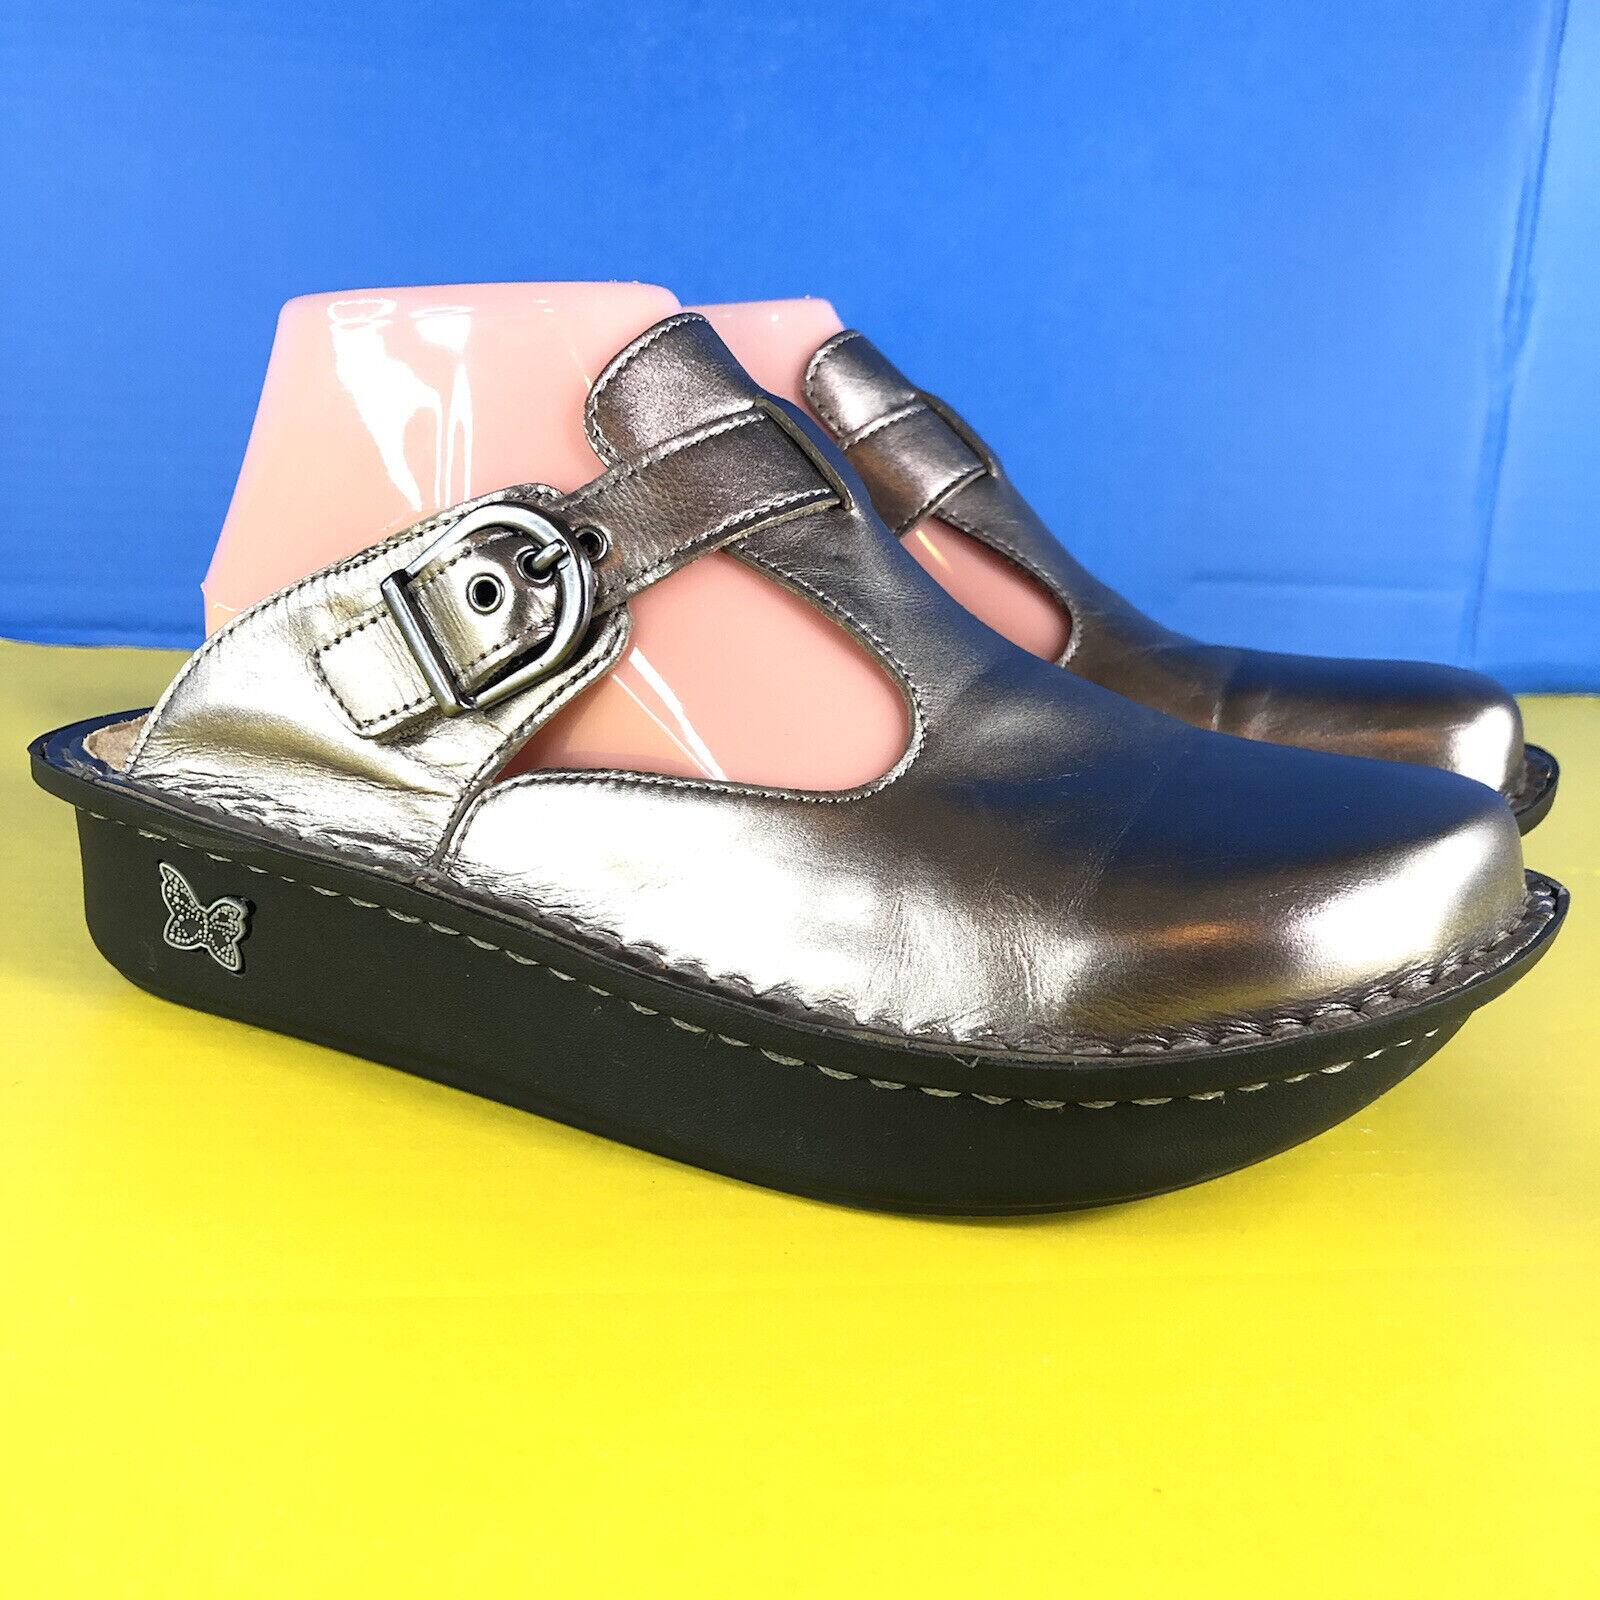 Alegria PG Lite ALG 204 Metallic Silver Women's Comfort Mule Clogs Shoes size 39